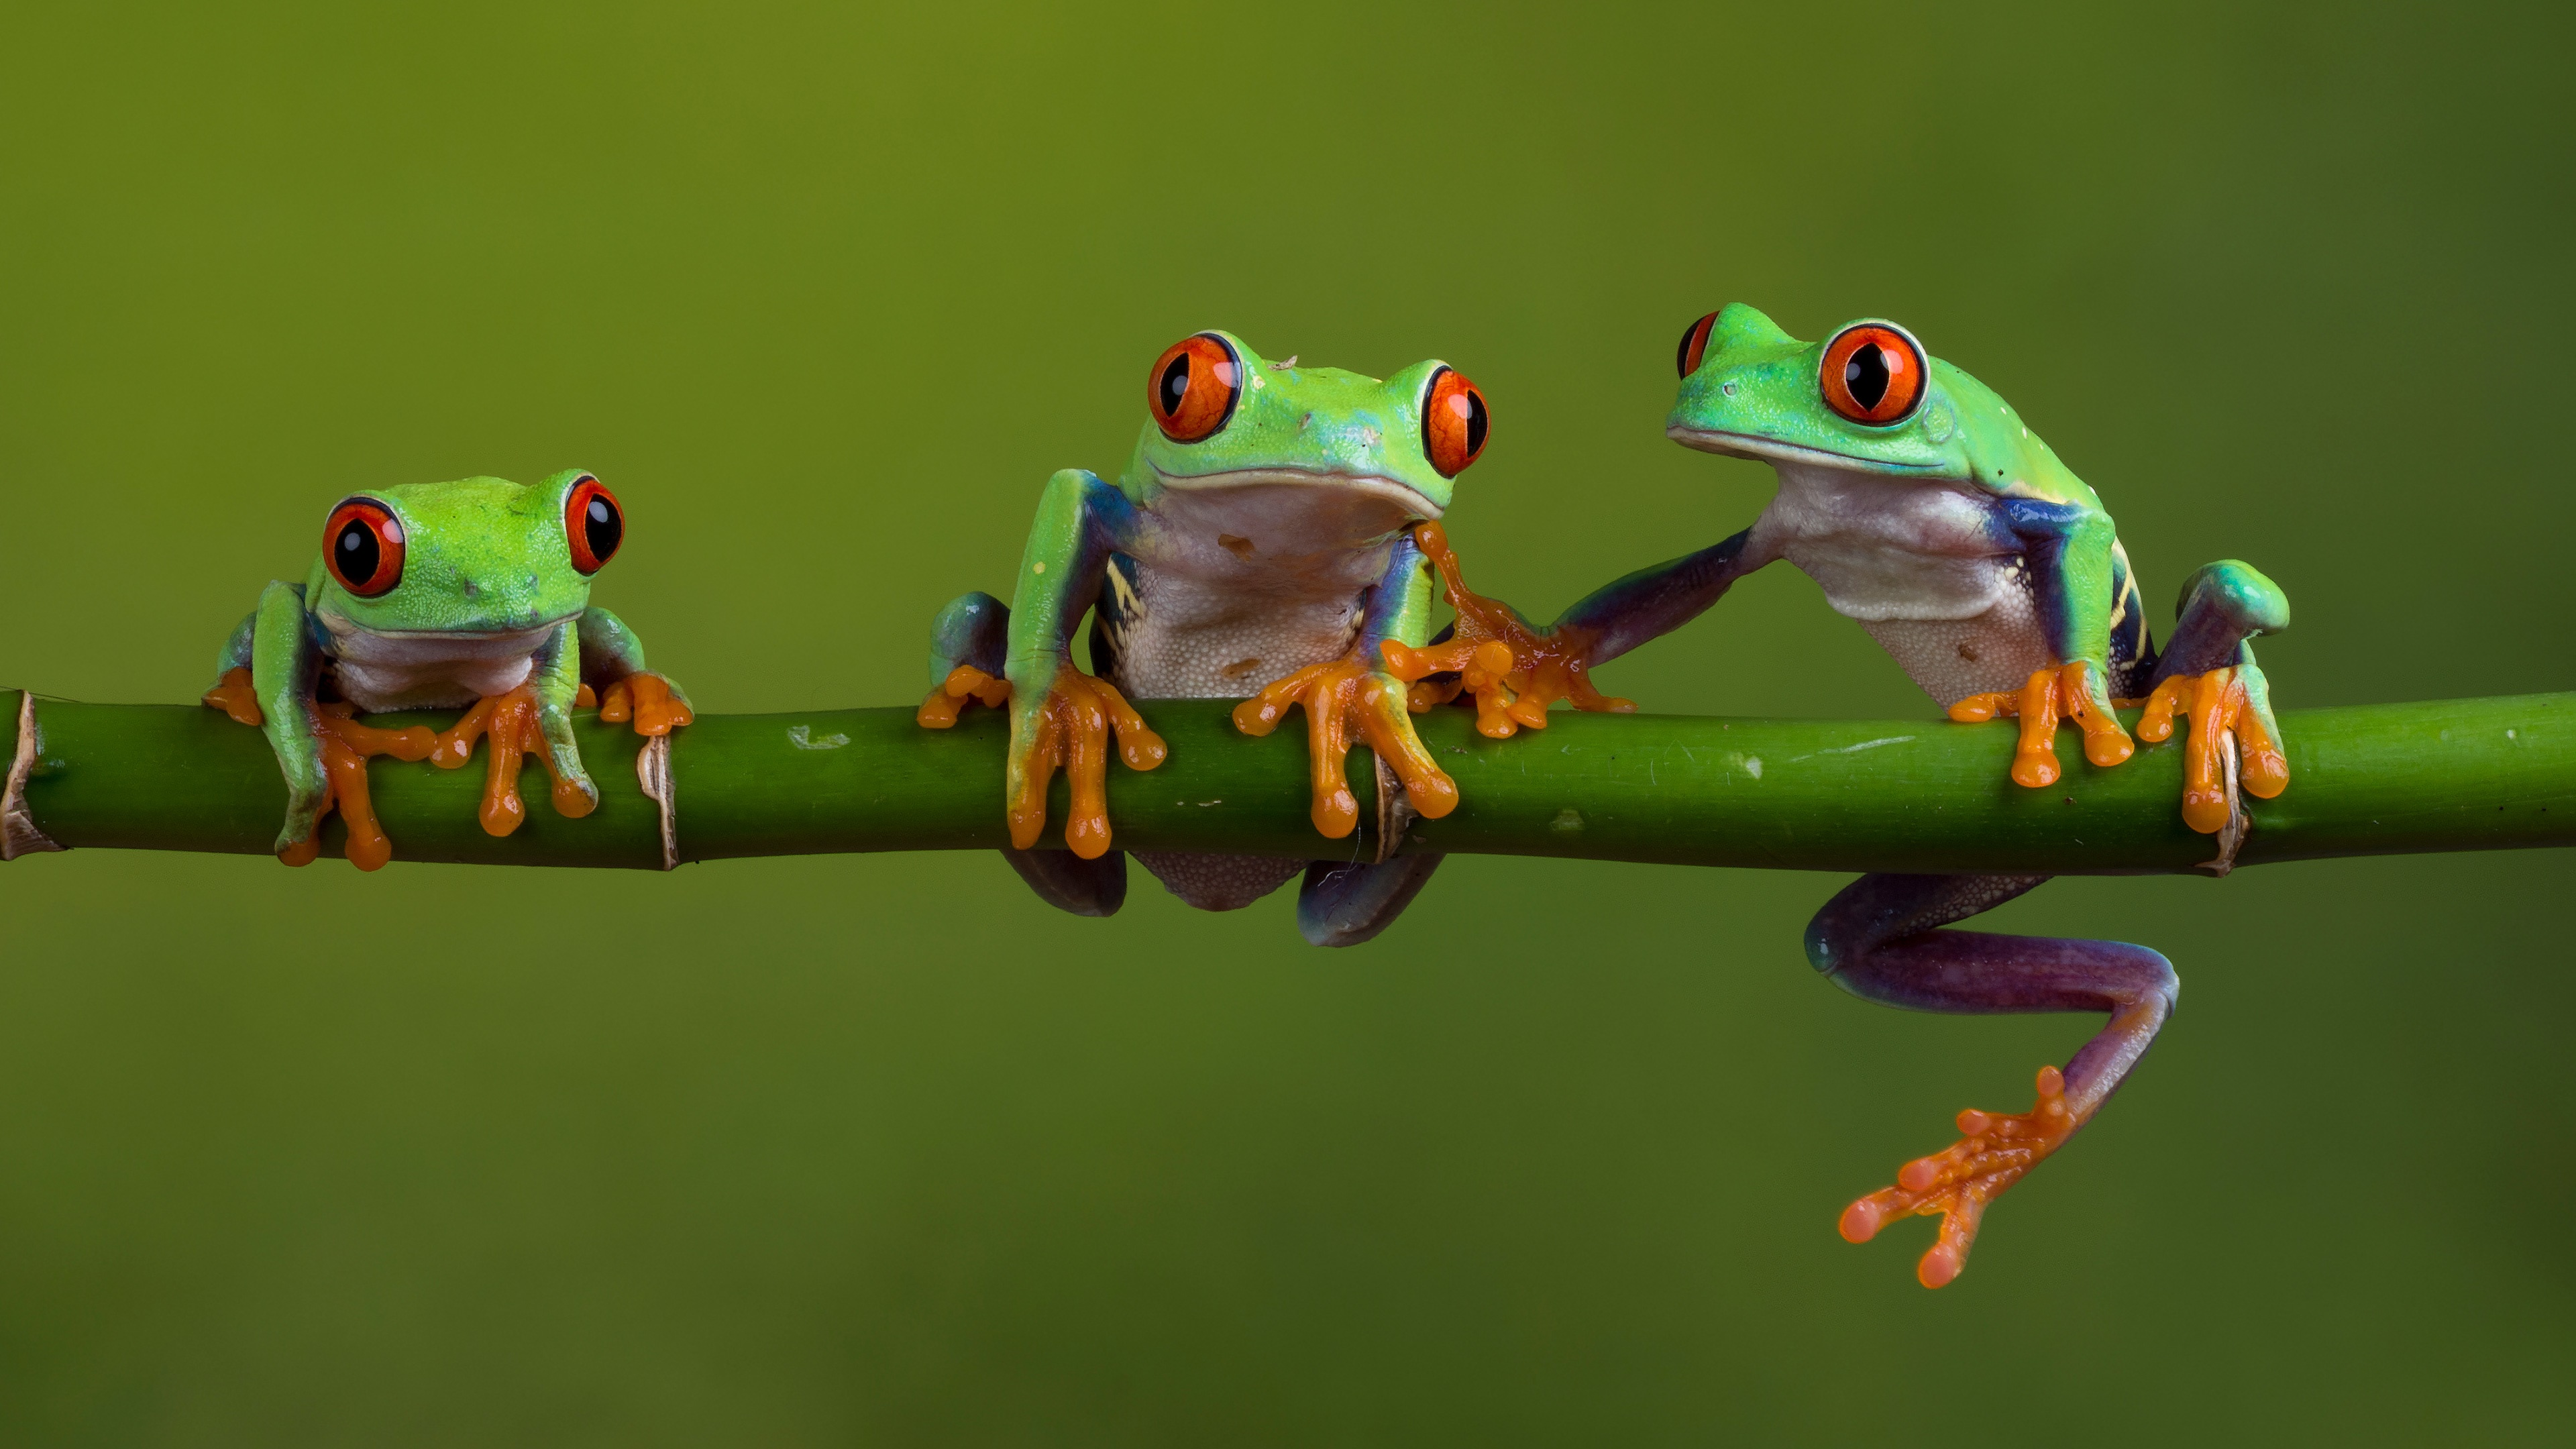 Three Red Eyed Tree Frogs 4k Ultra Hd Wallpaper Hintergrund 3840x2160